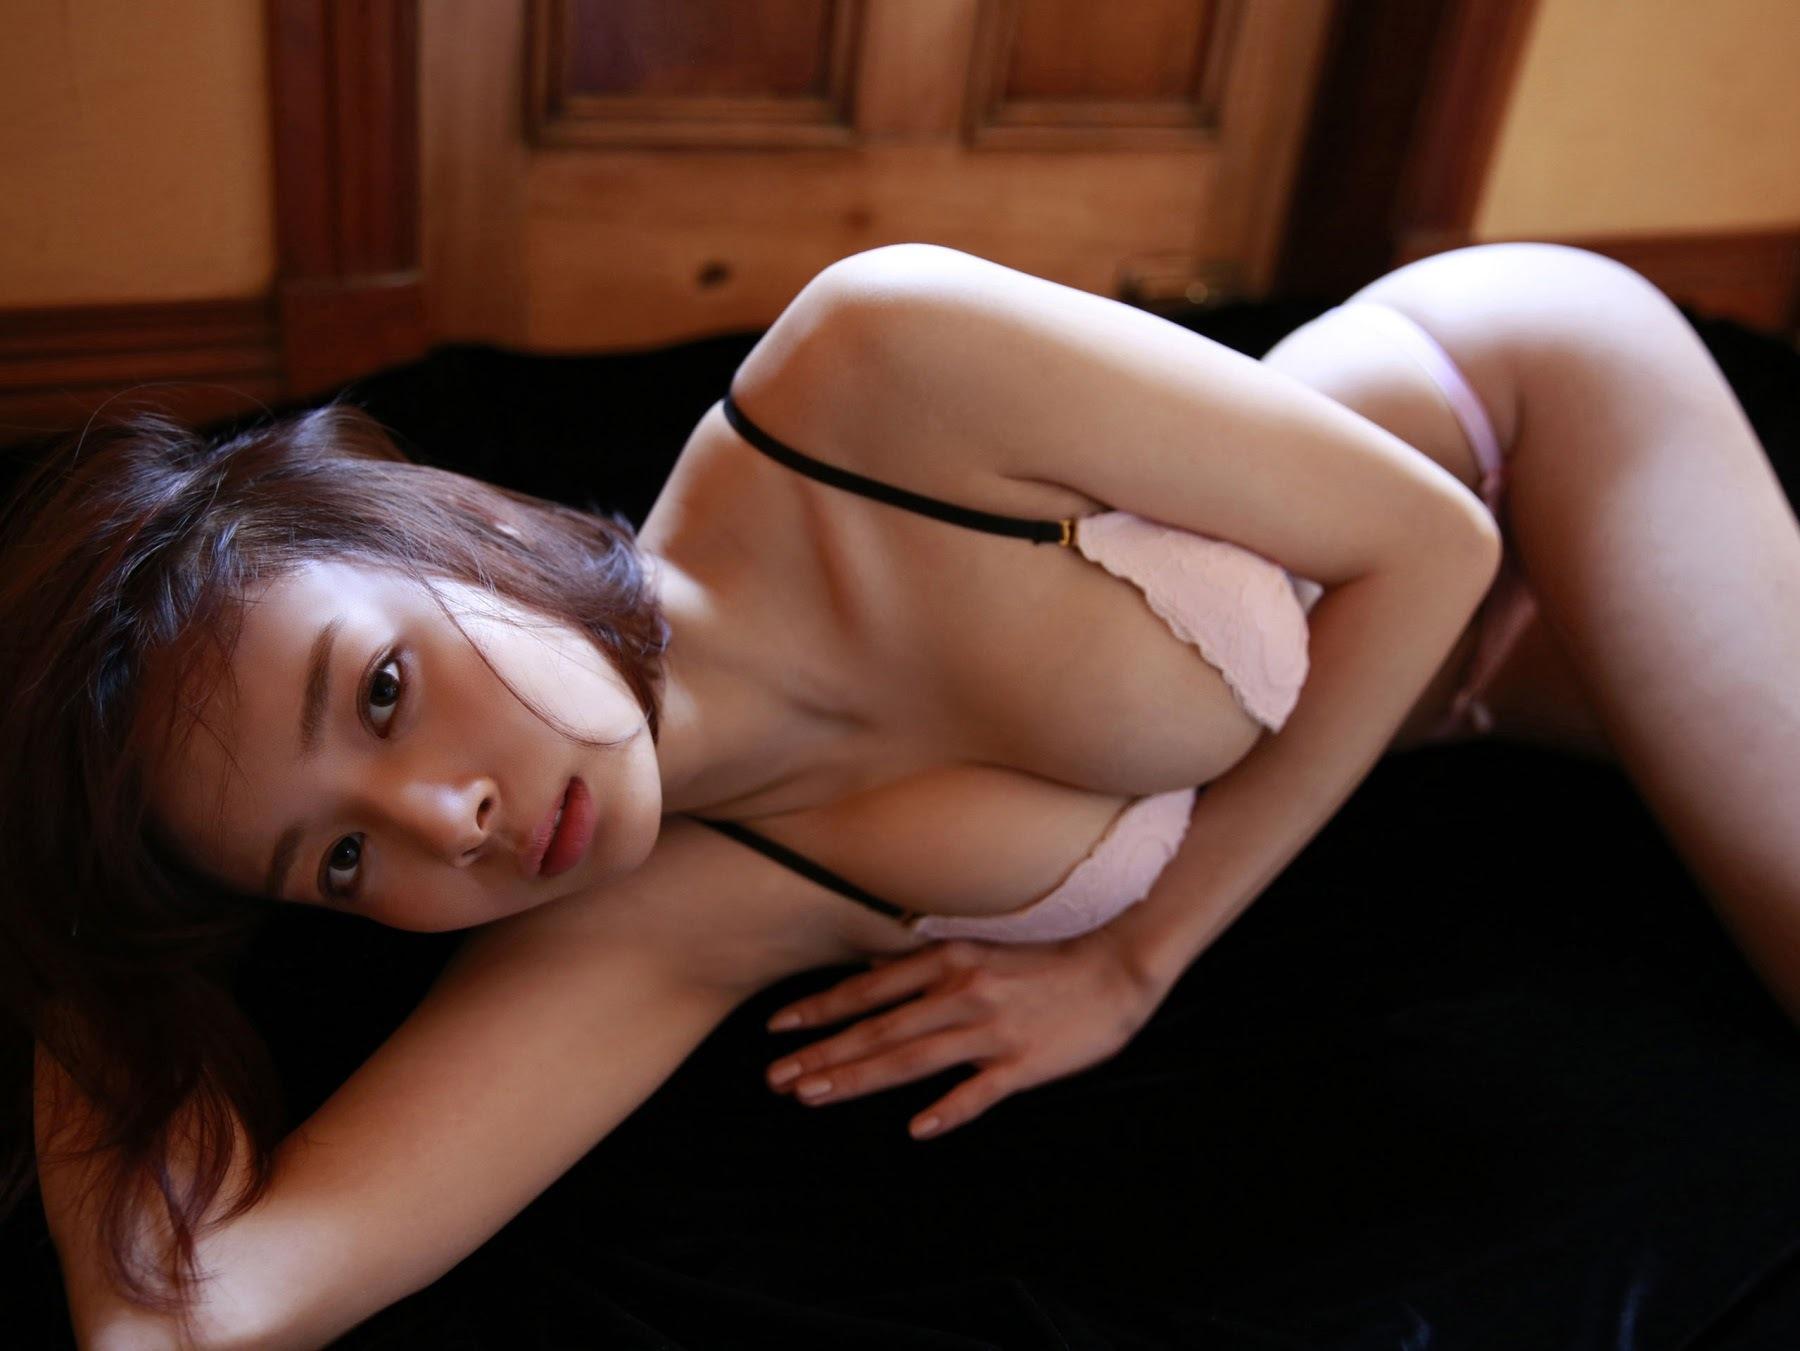 23 years old Shaka Okada, who is also a professional mahjong player040